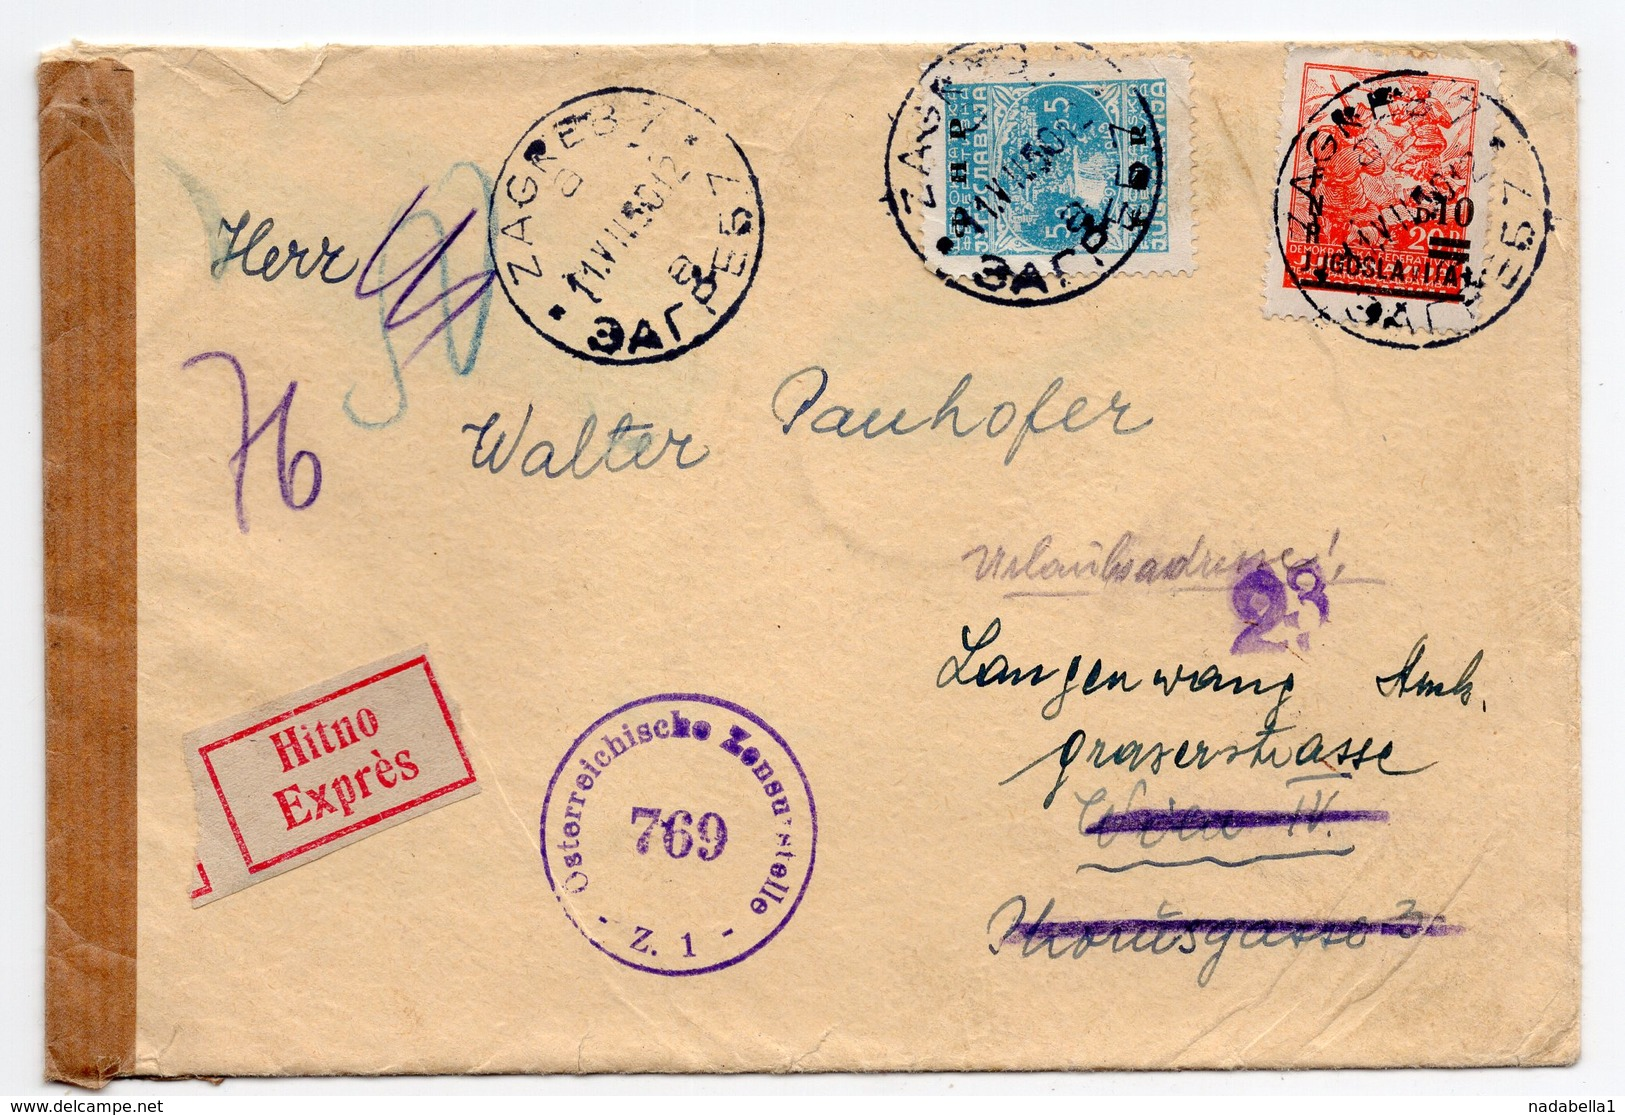 11.07.1950. YUGOSLAVIA, CROATIA, ZAGREB TO VIENNA, CENSORED IN AUSTRIA,REDIRECTED, REGISTERED MAIL - 1945-1992 Socialist Federal Republic Of Yugoslavia